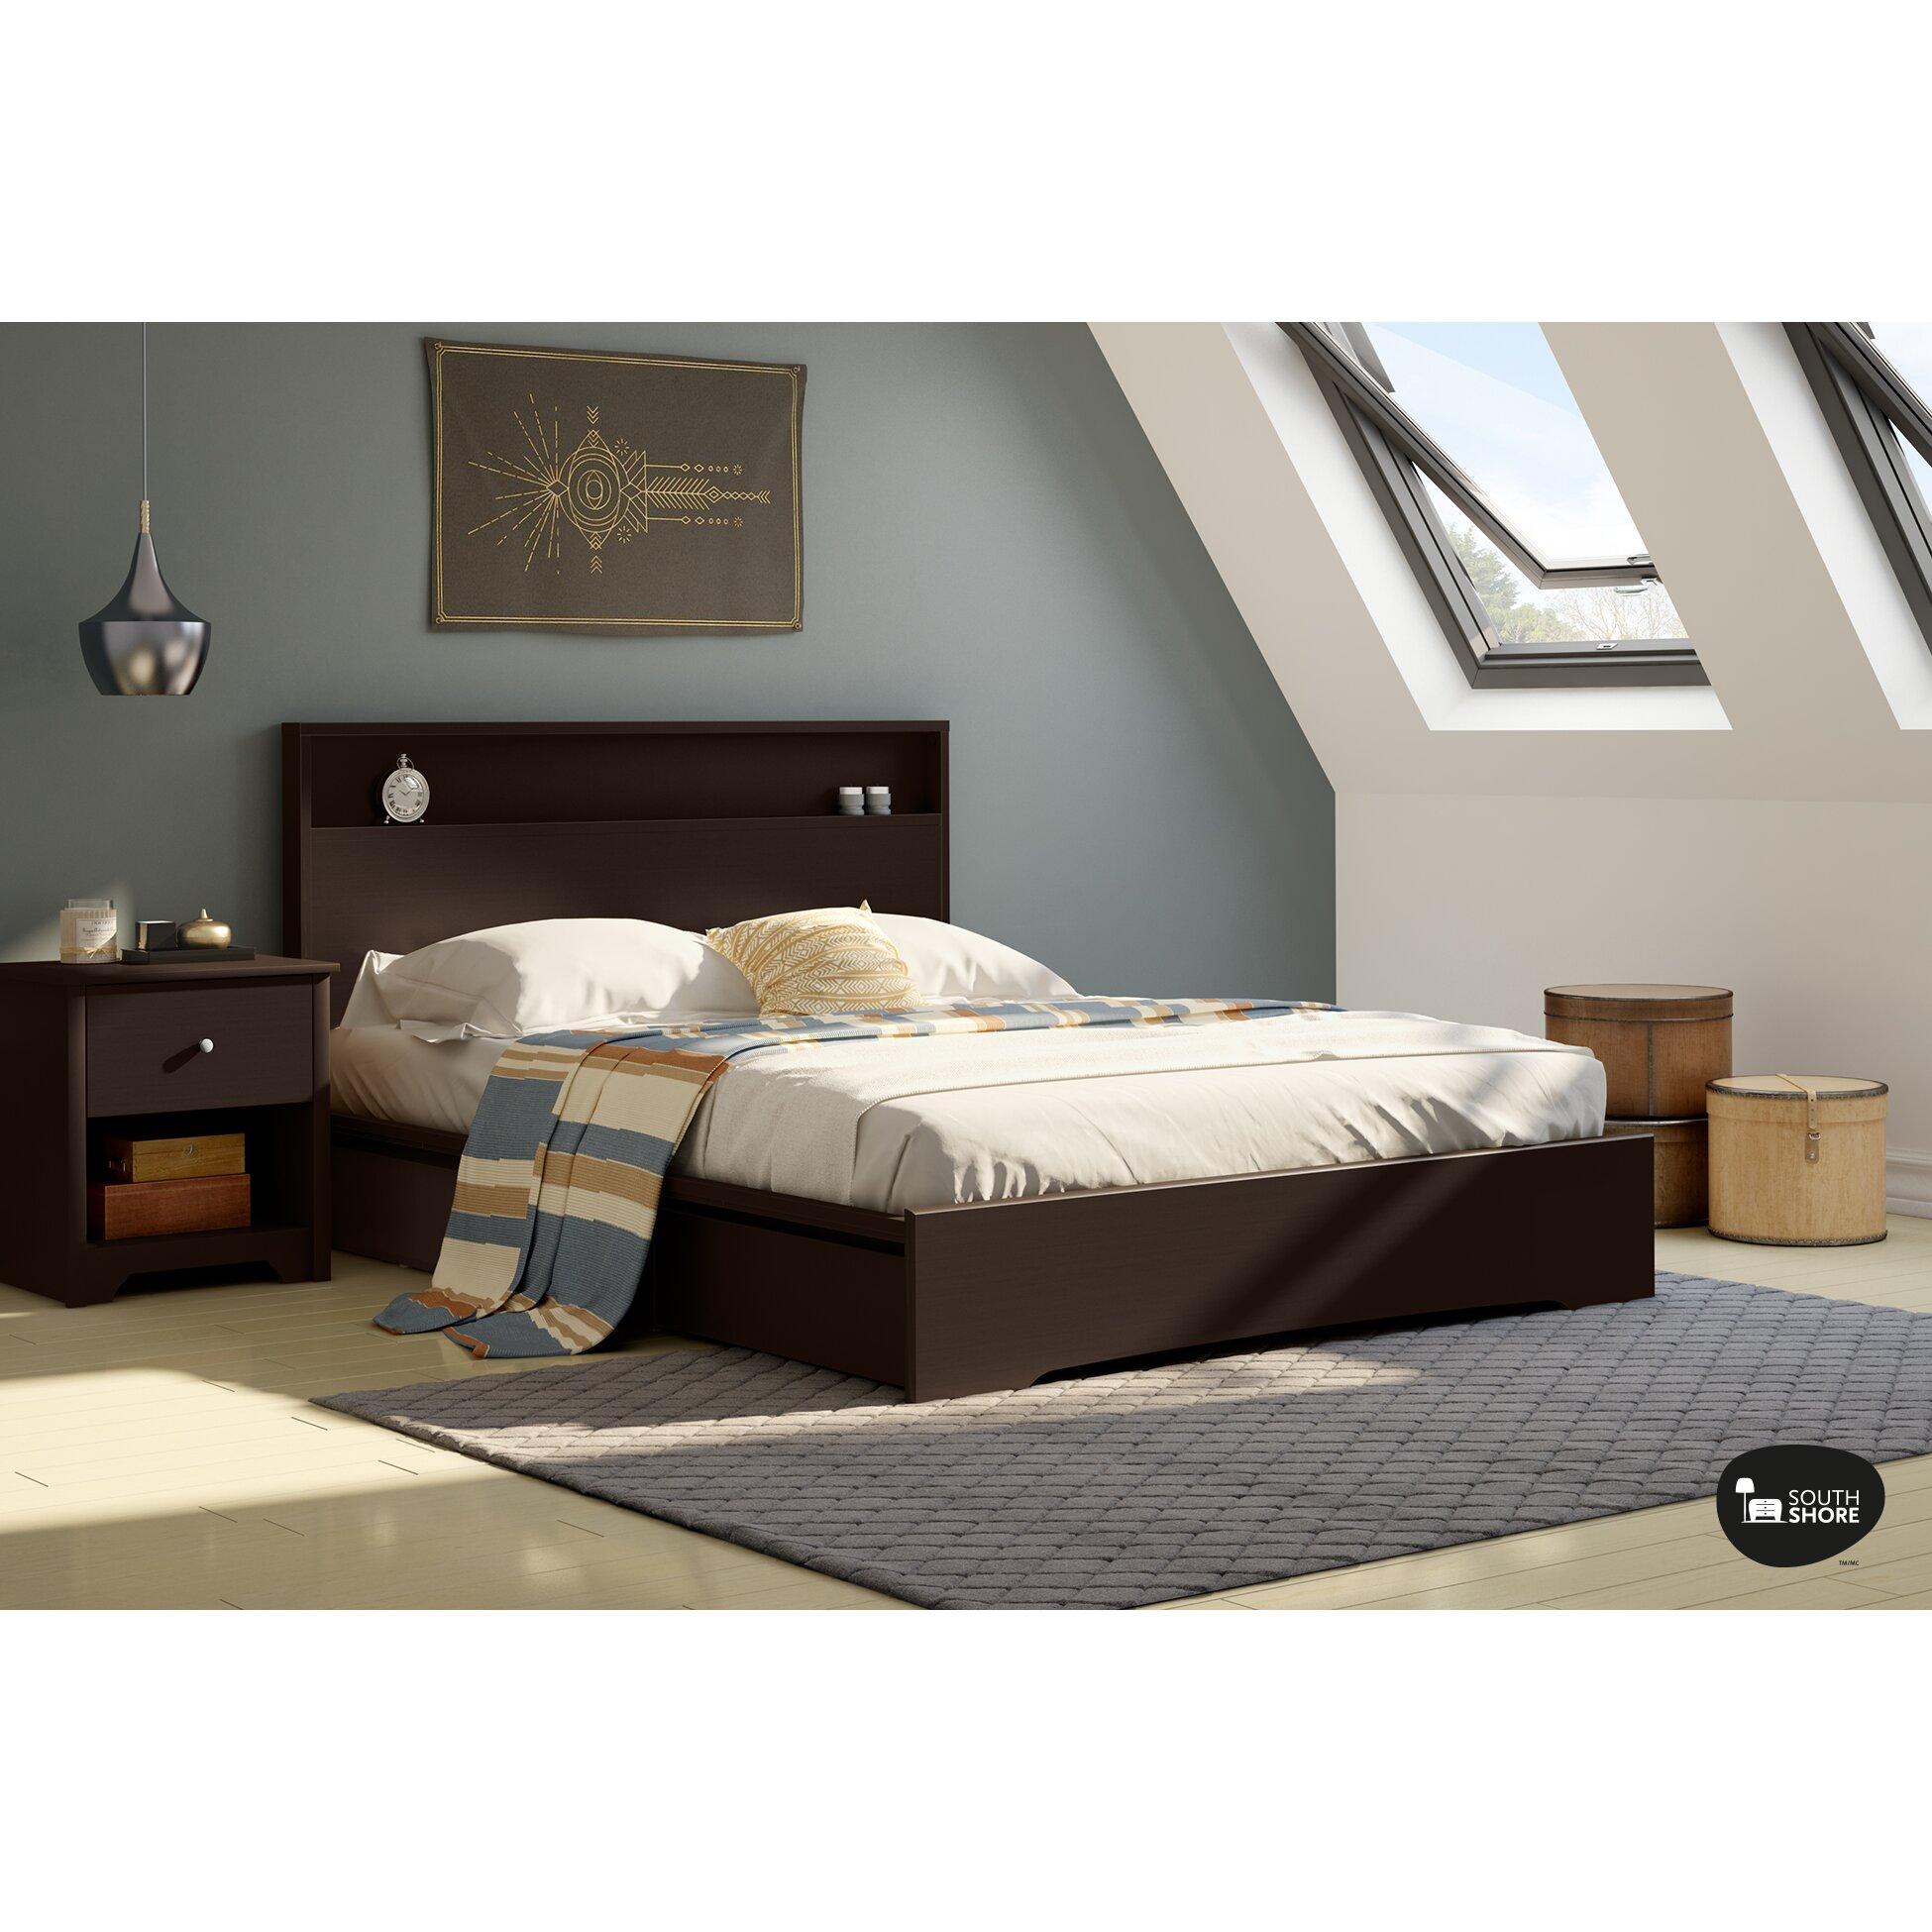 south shore basic queen storage platform bed